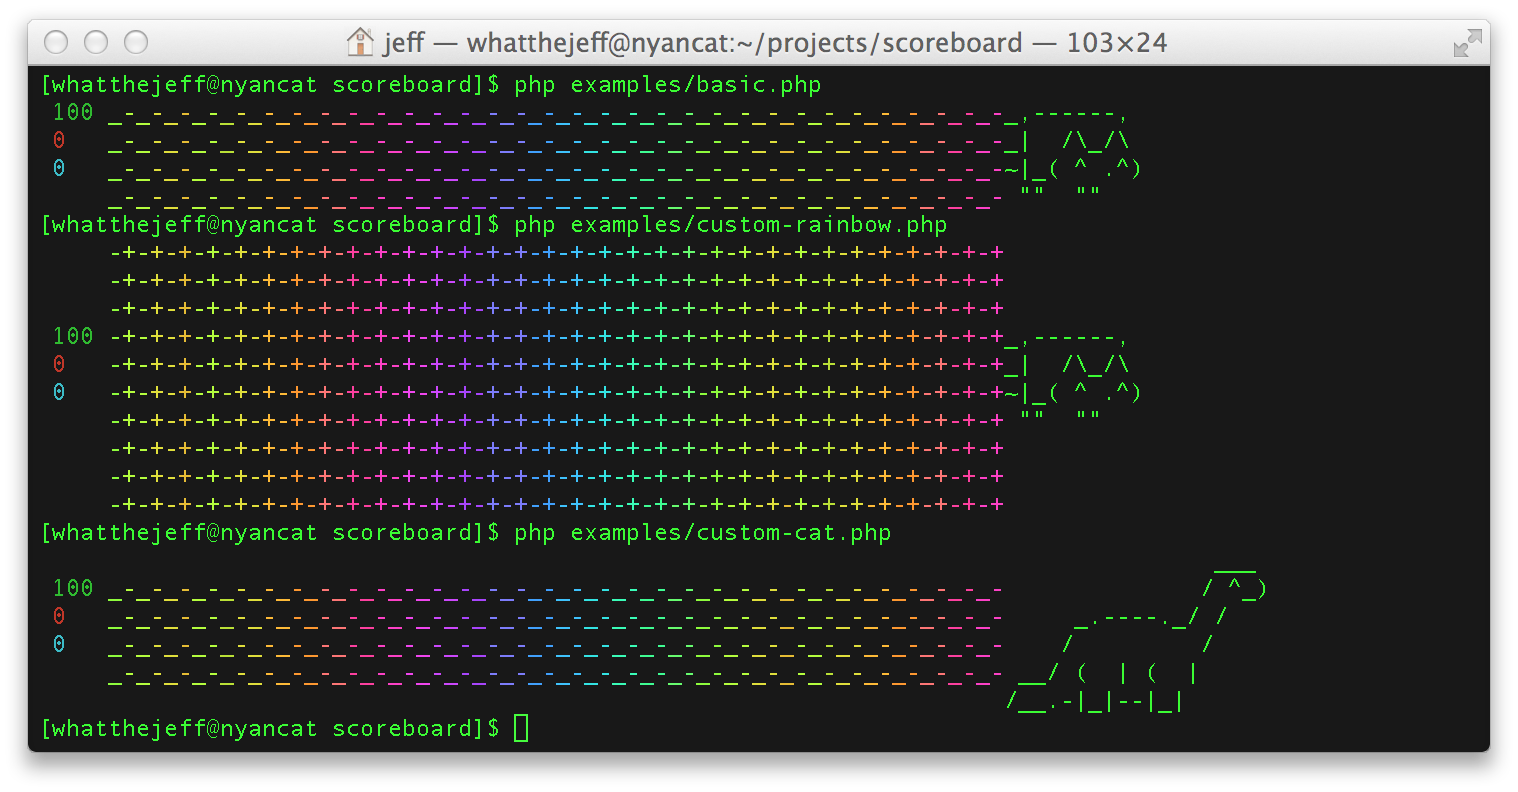 Nyan Cat Scoreboard